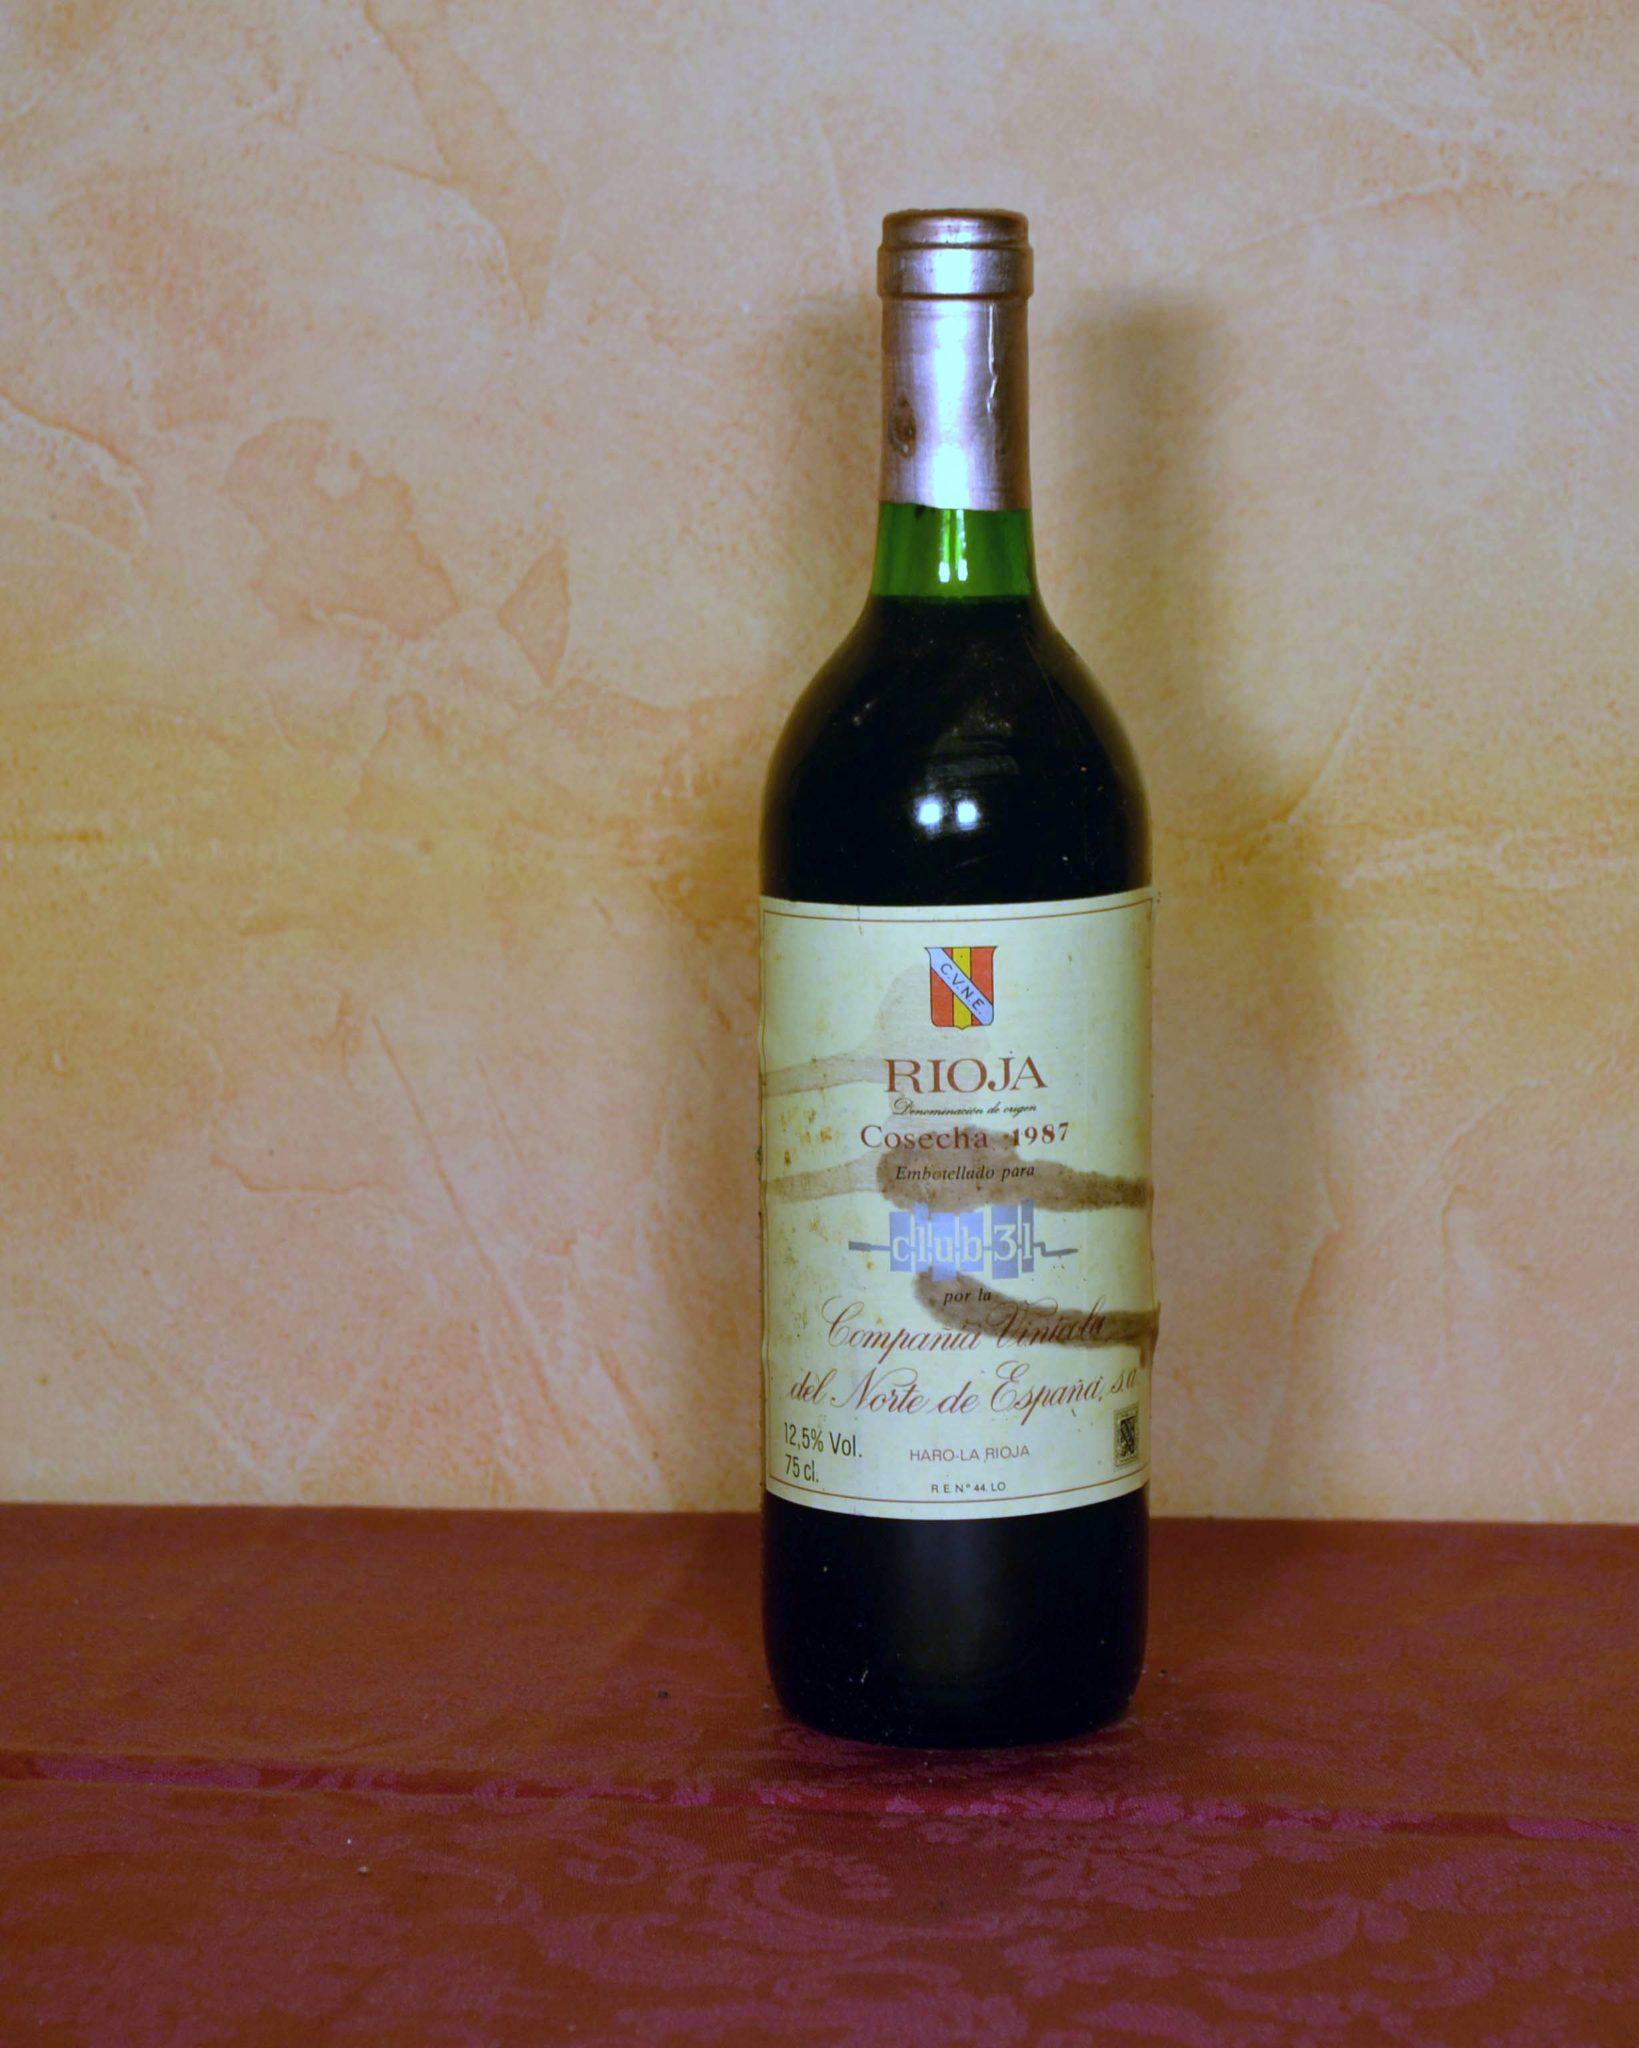 Rioja Cune Vintage 1987